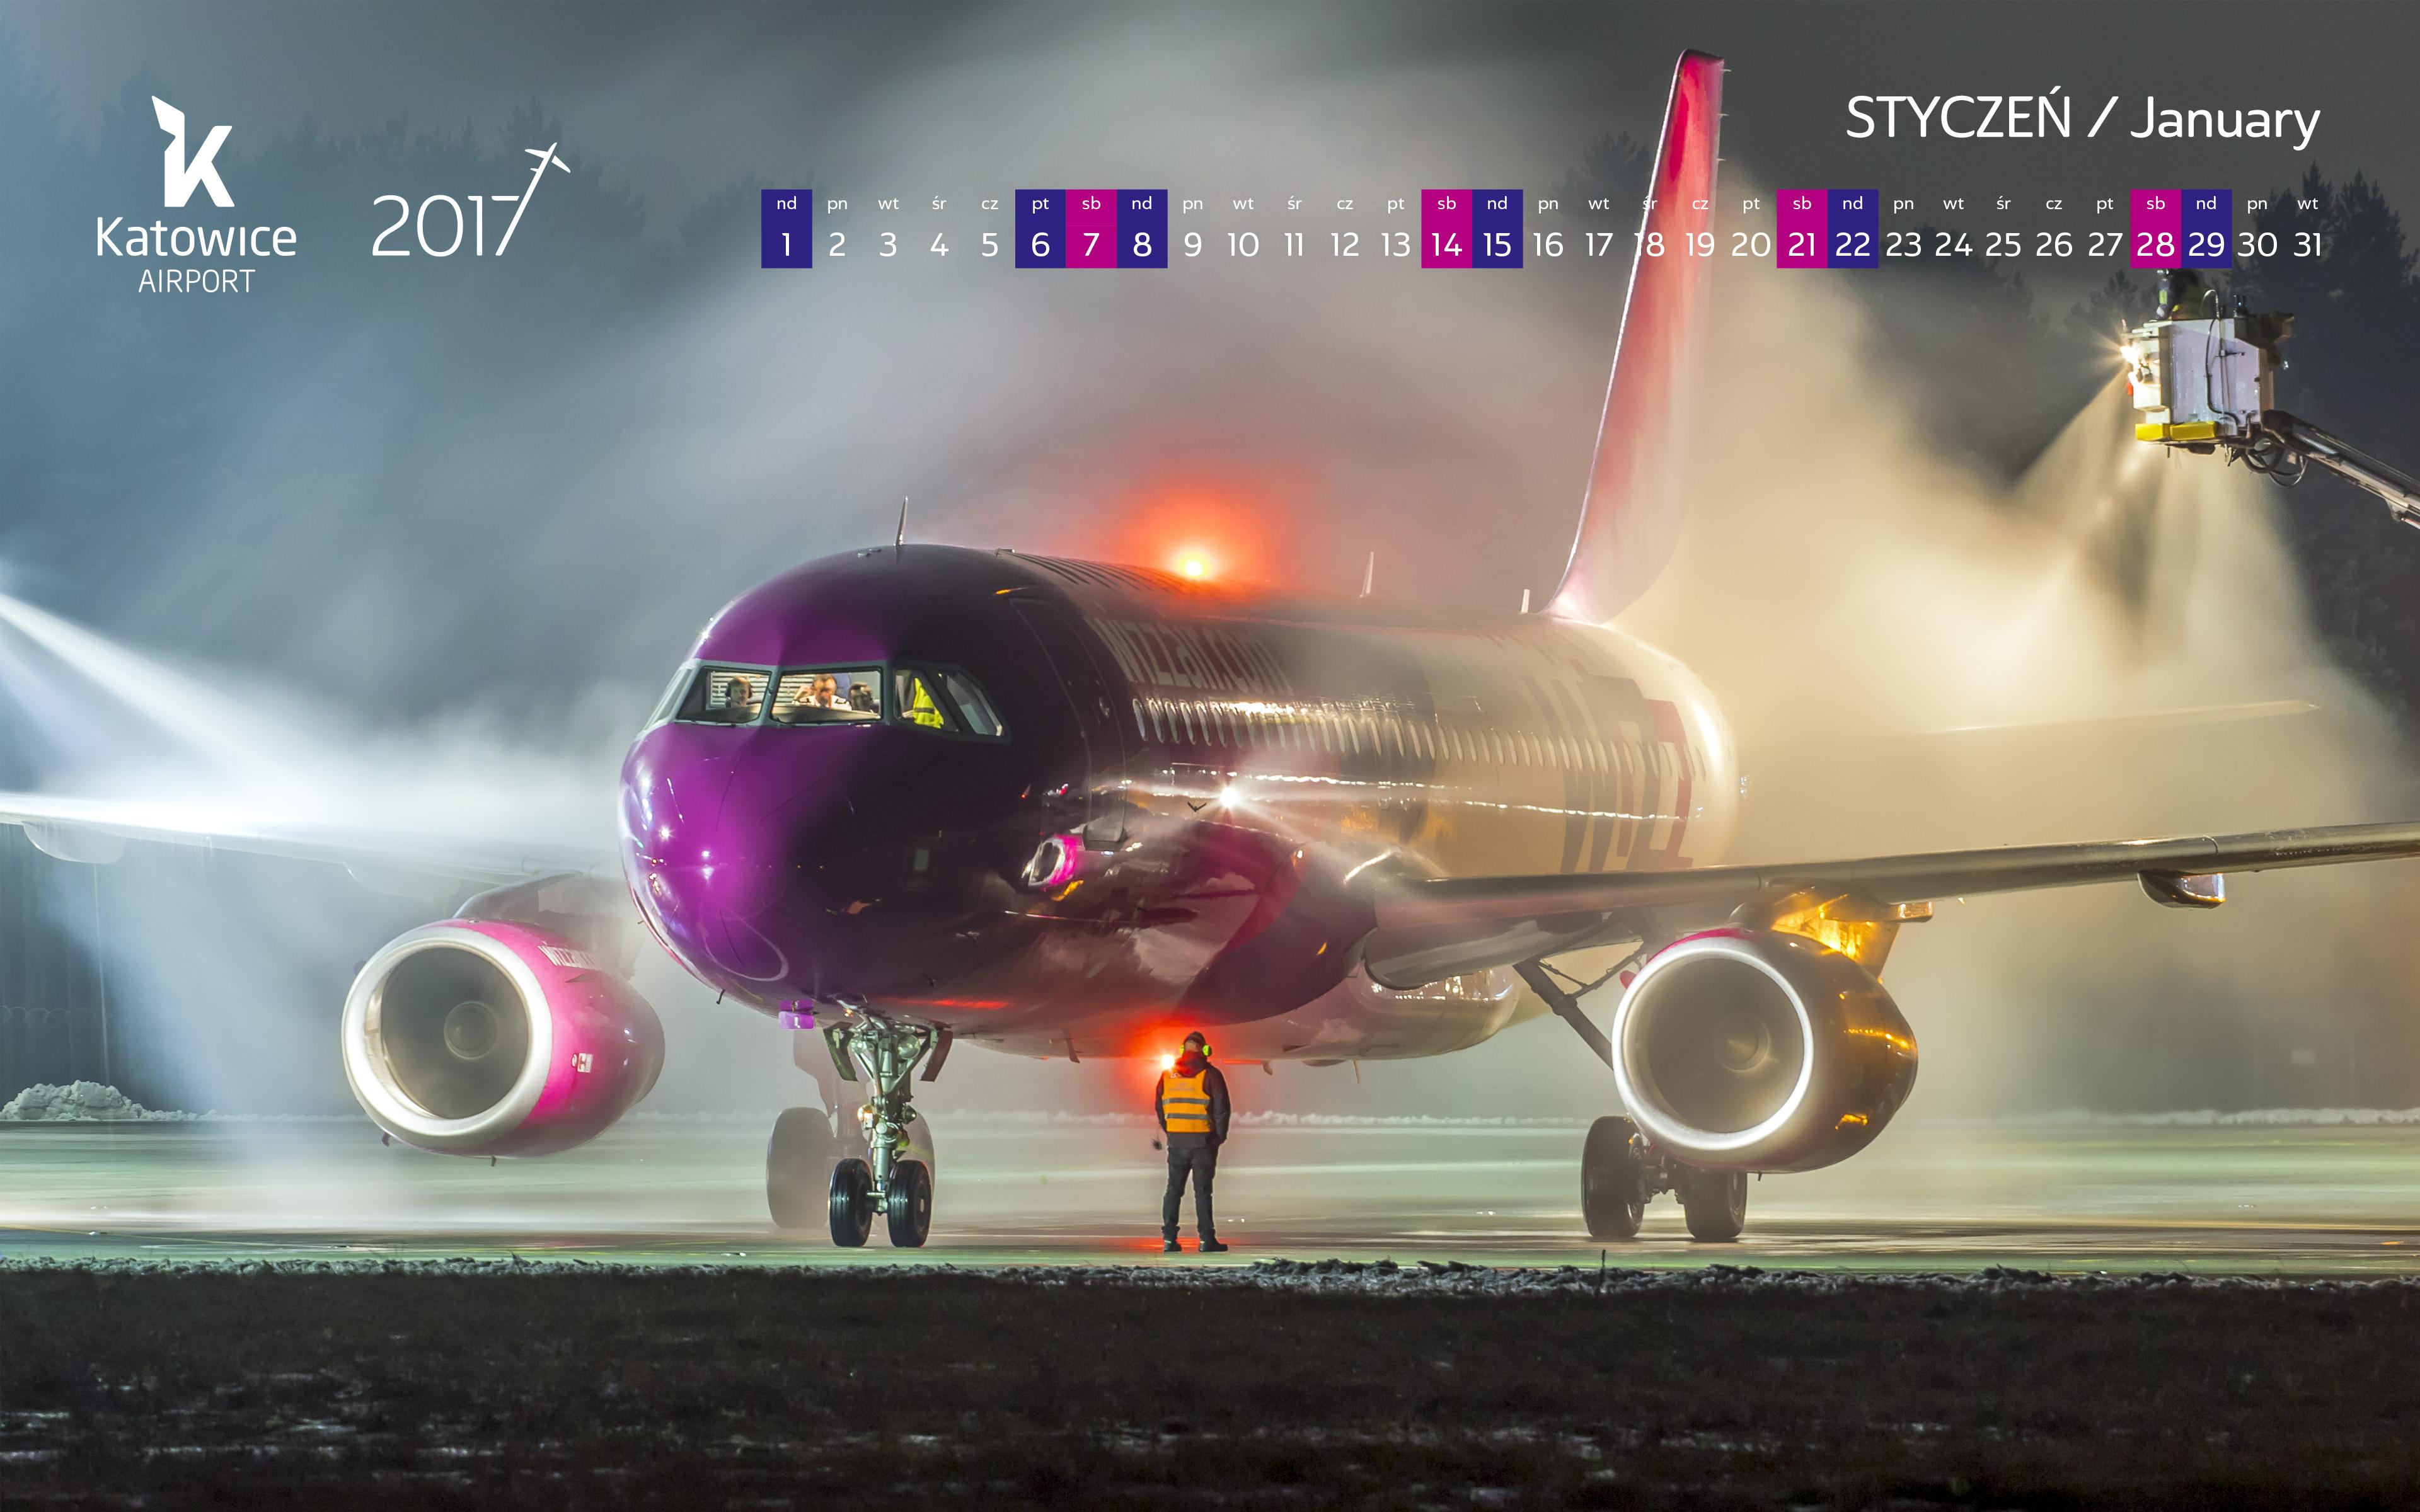 katowice_airport_16x10